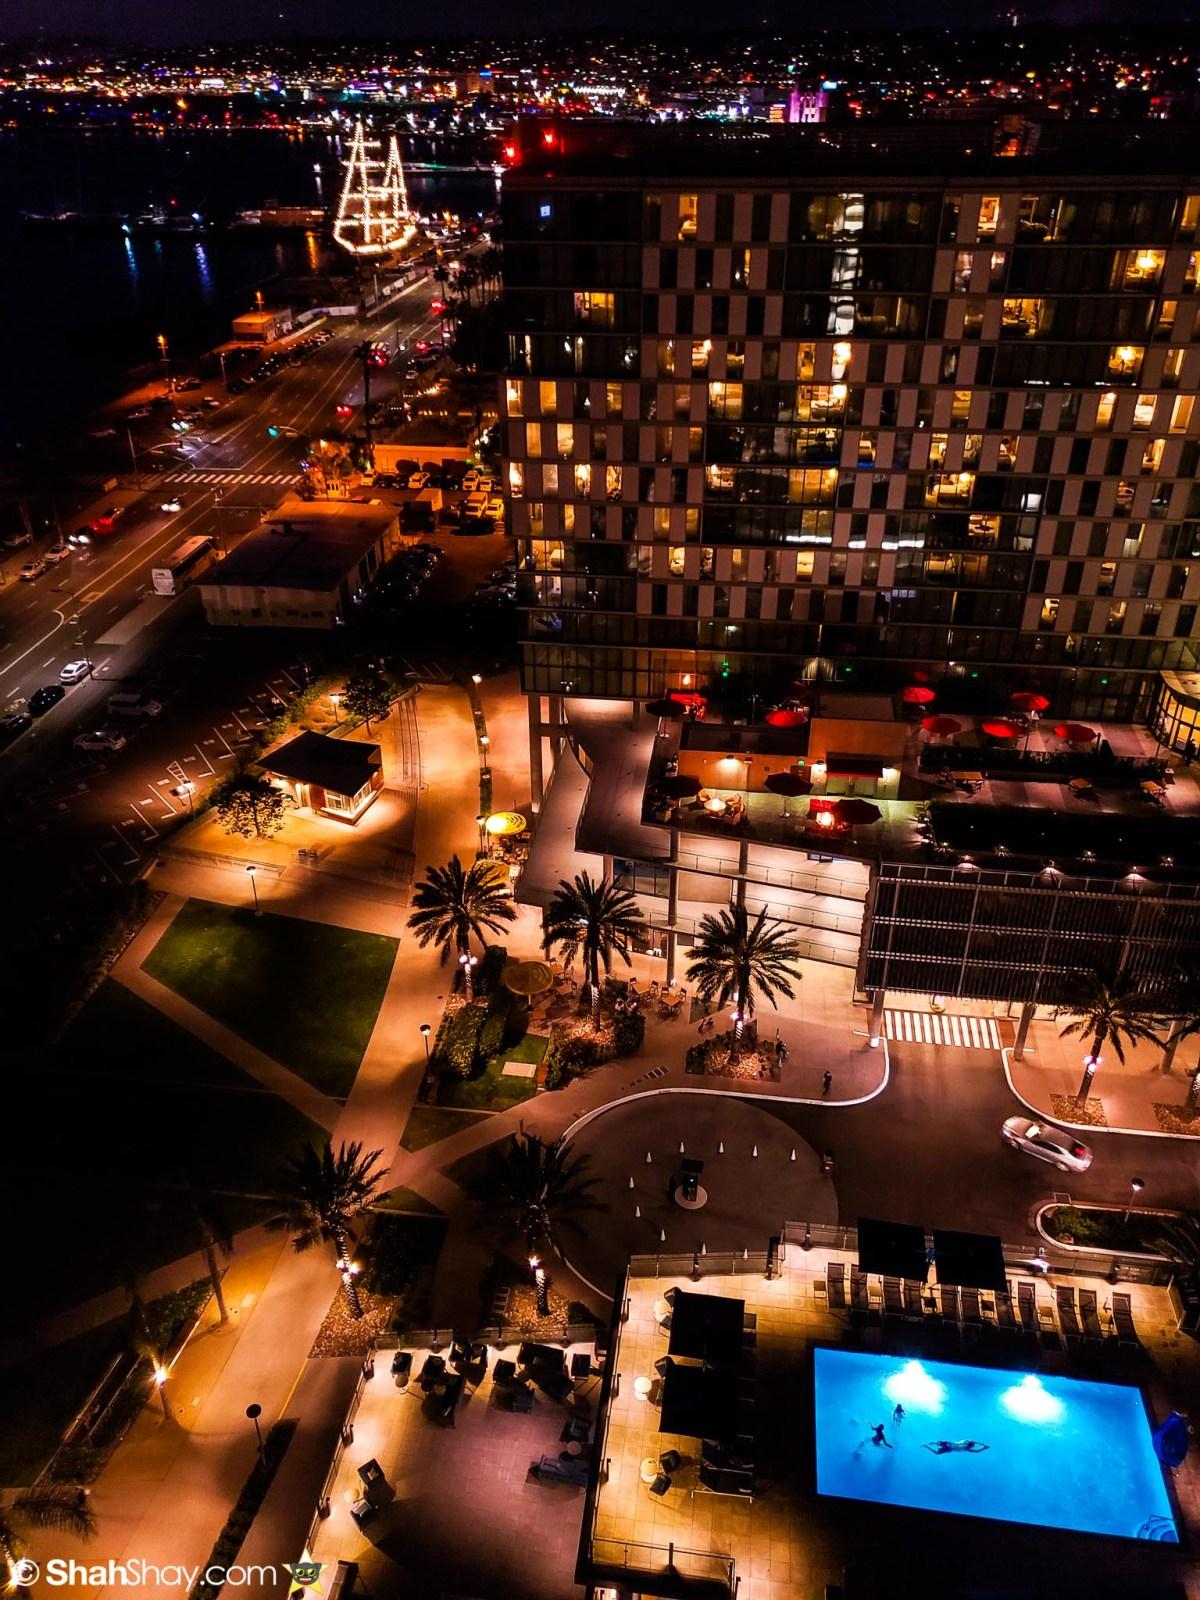 InterContinental San Diego Fitness Center - Night View